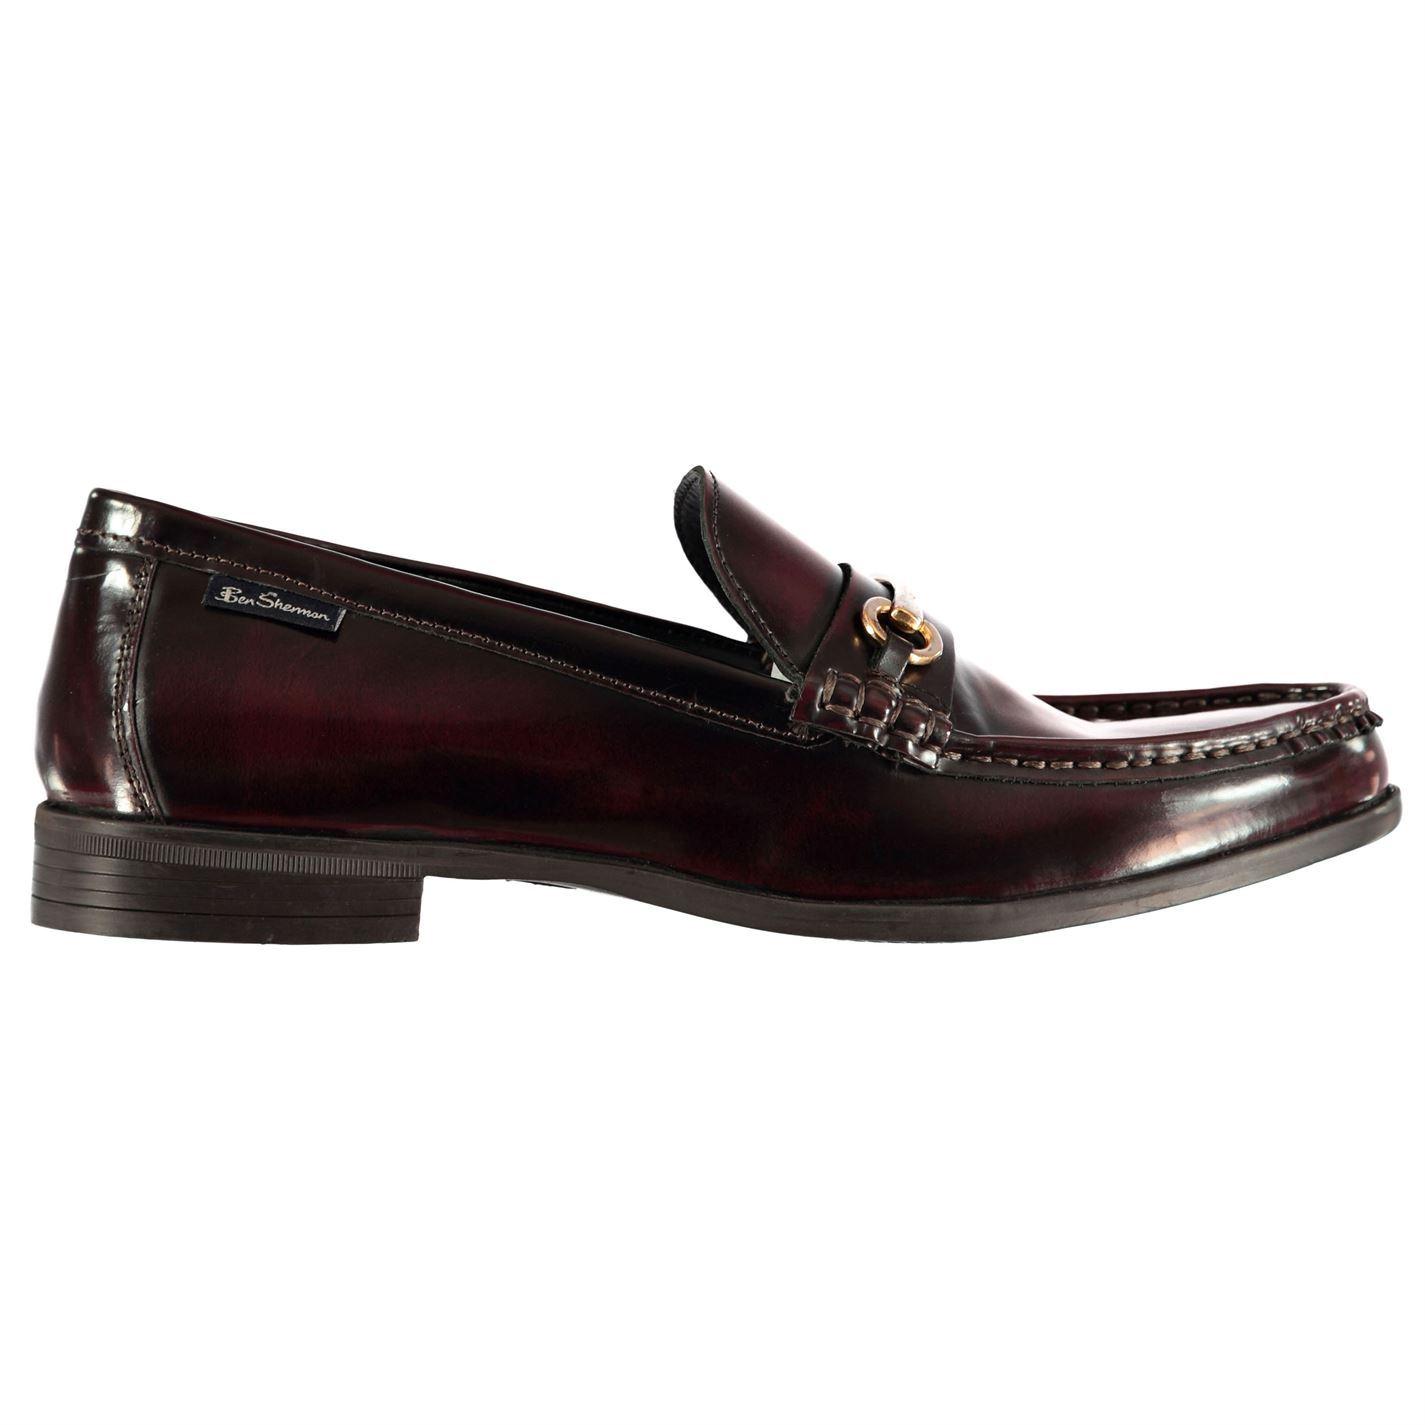 Ben-Sherman-Luca-Loafers-Slip-On-Shoes-Mens-Formal-Footwear-Flats thumbnail 10